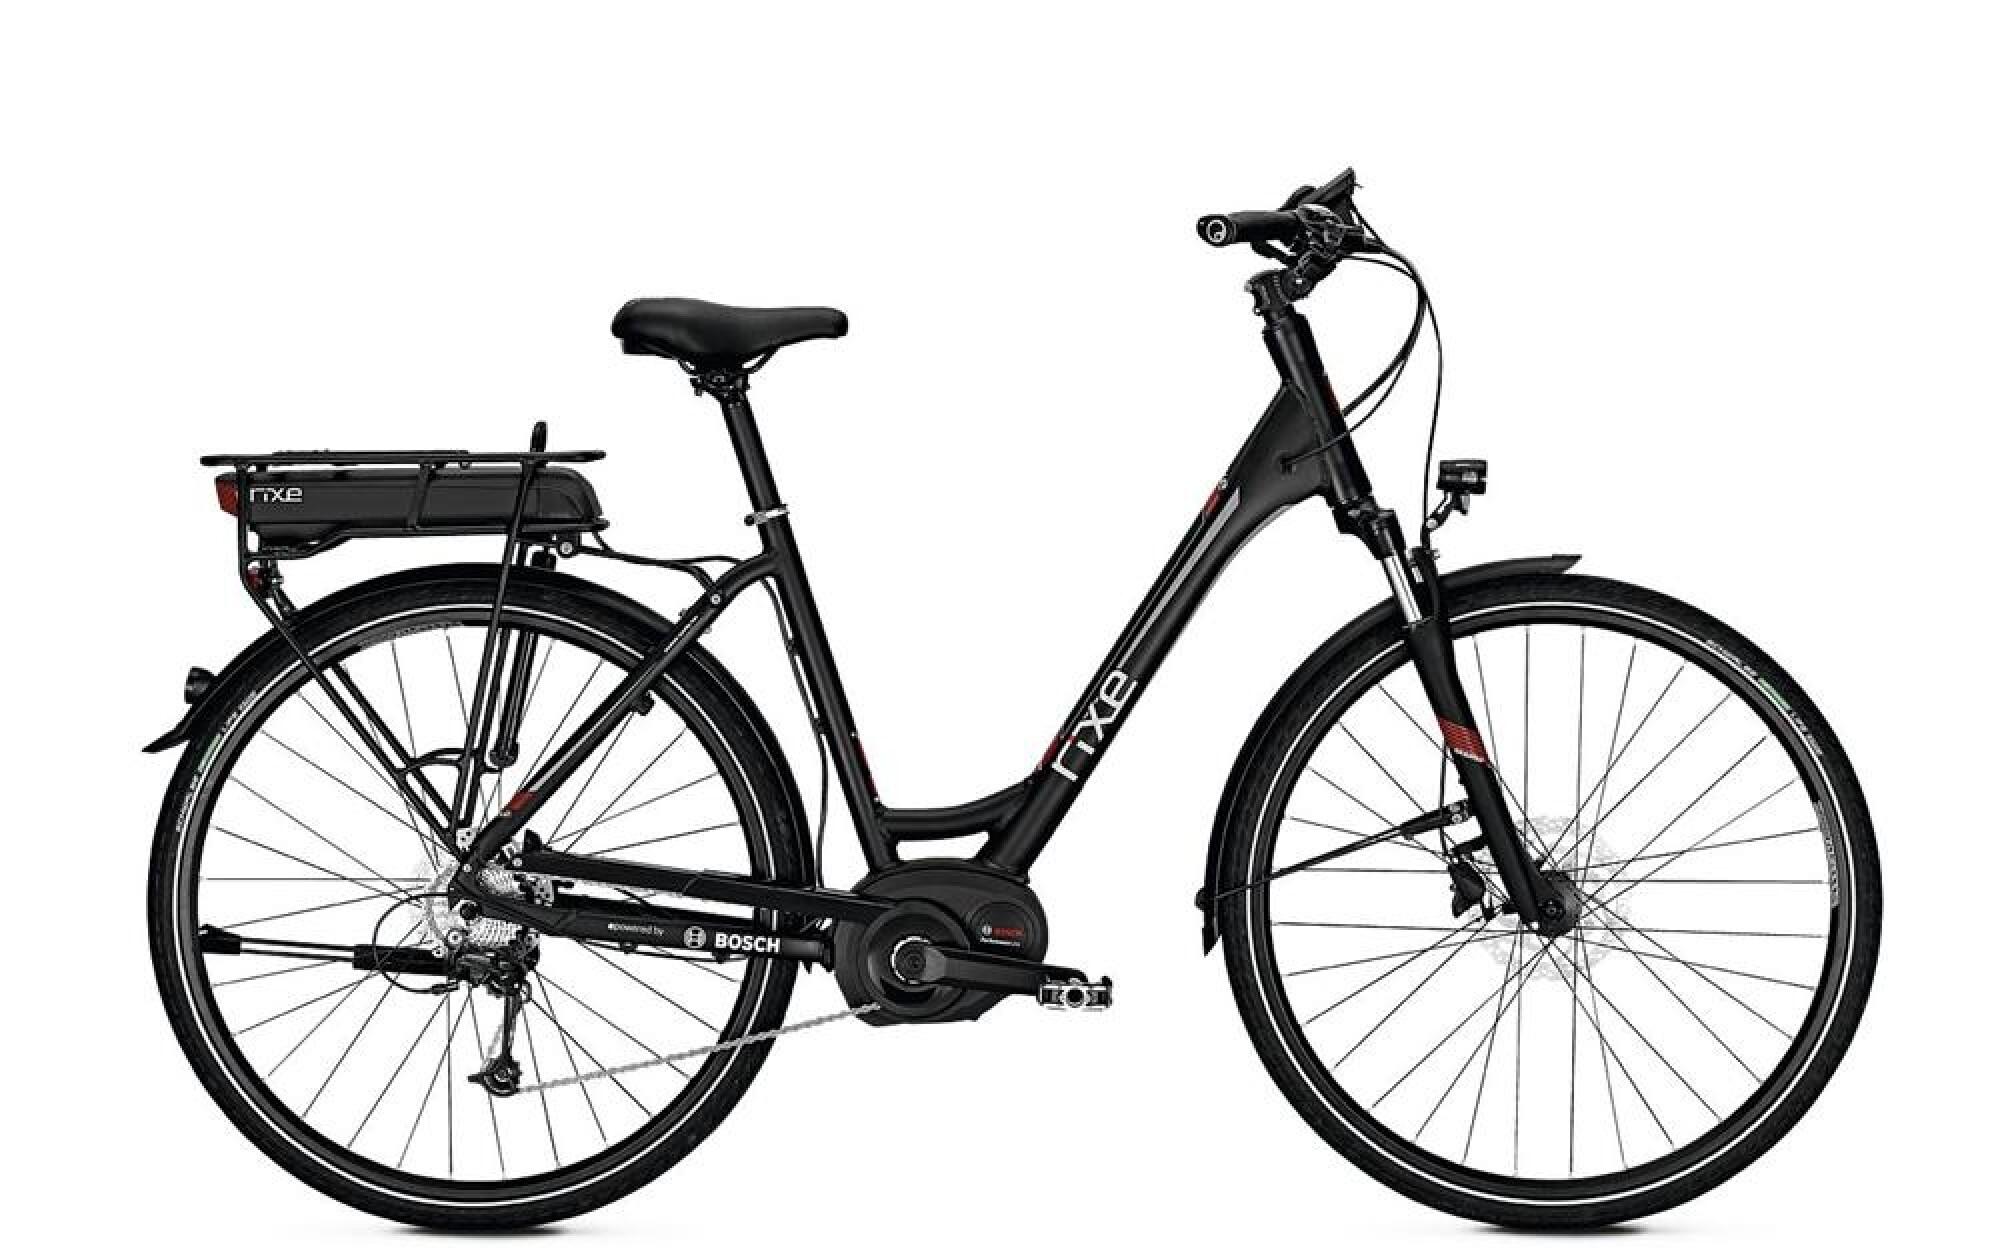 e bike rixe montpellier b9 2018 bei alle. Black Bedroom Furniture Sets. Home Design Ideas